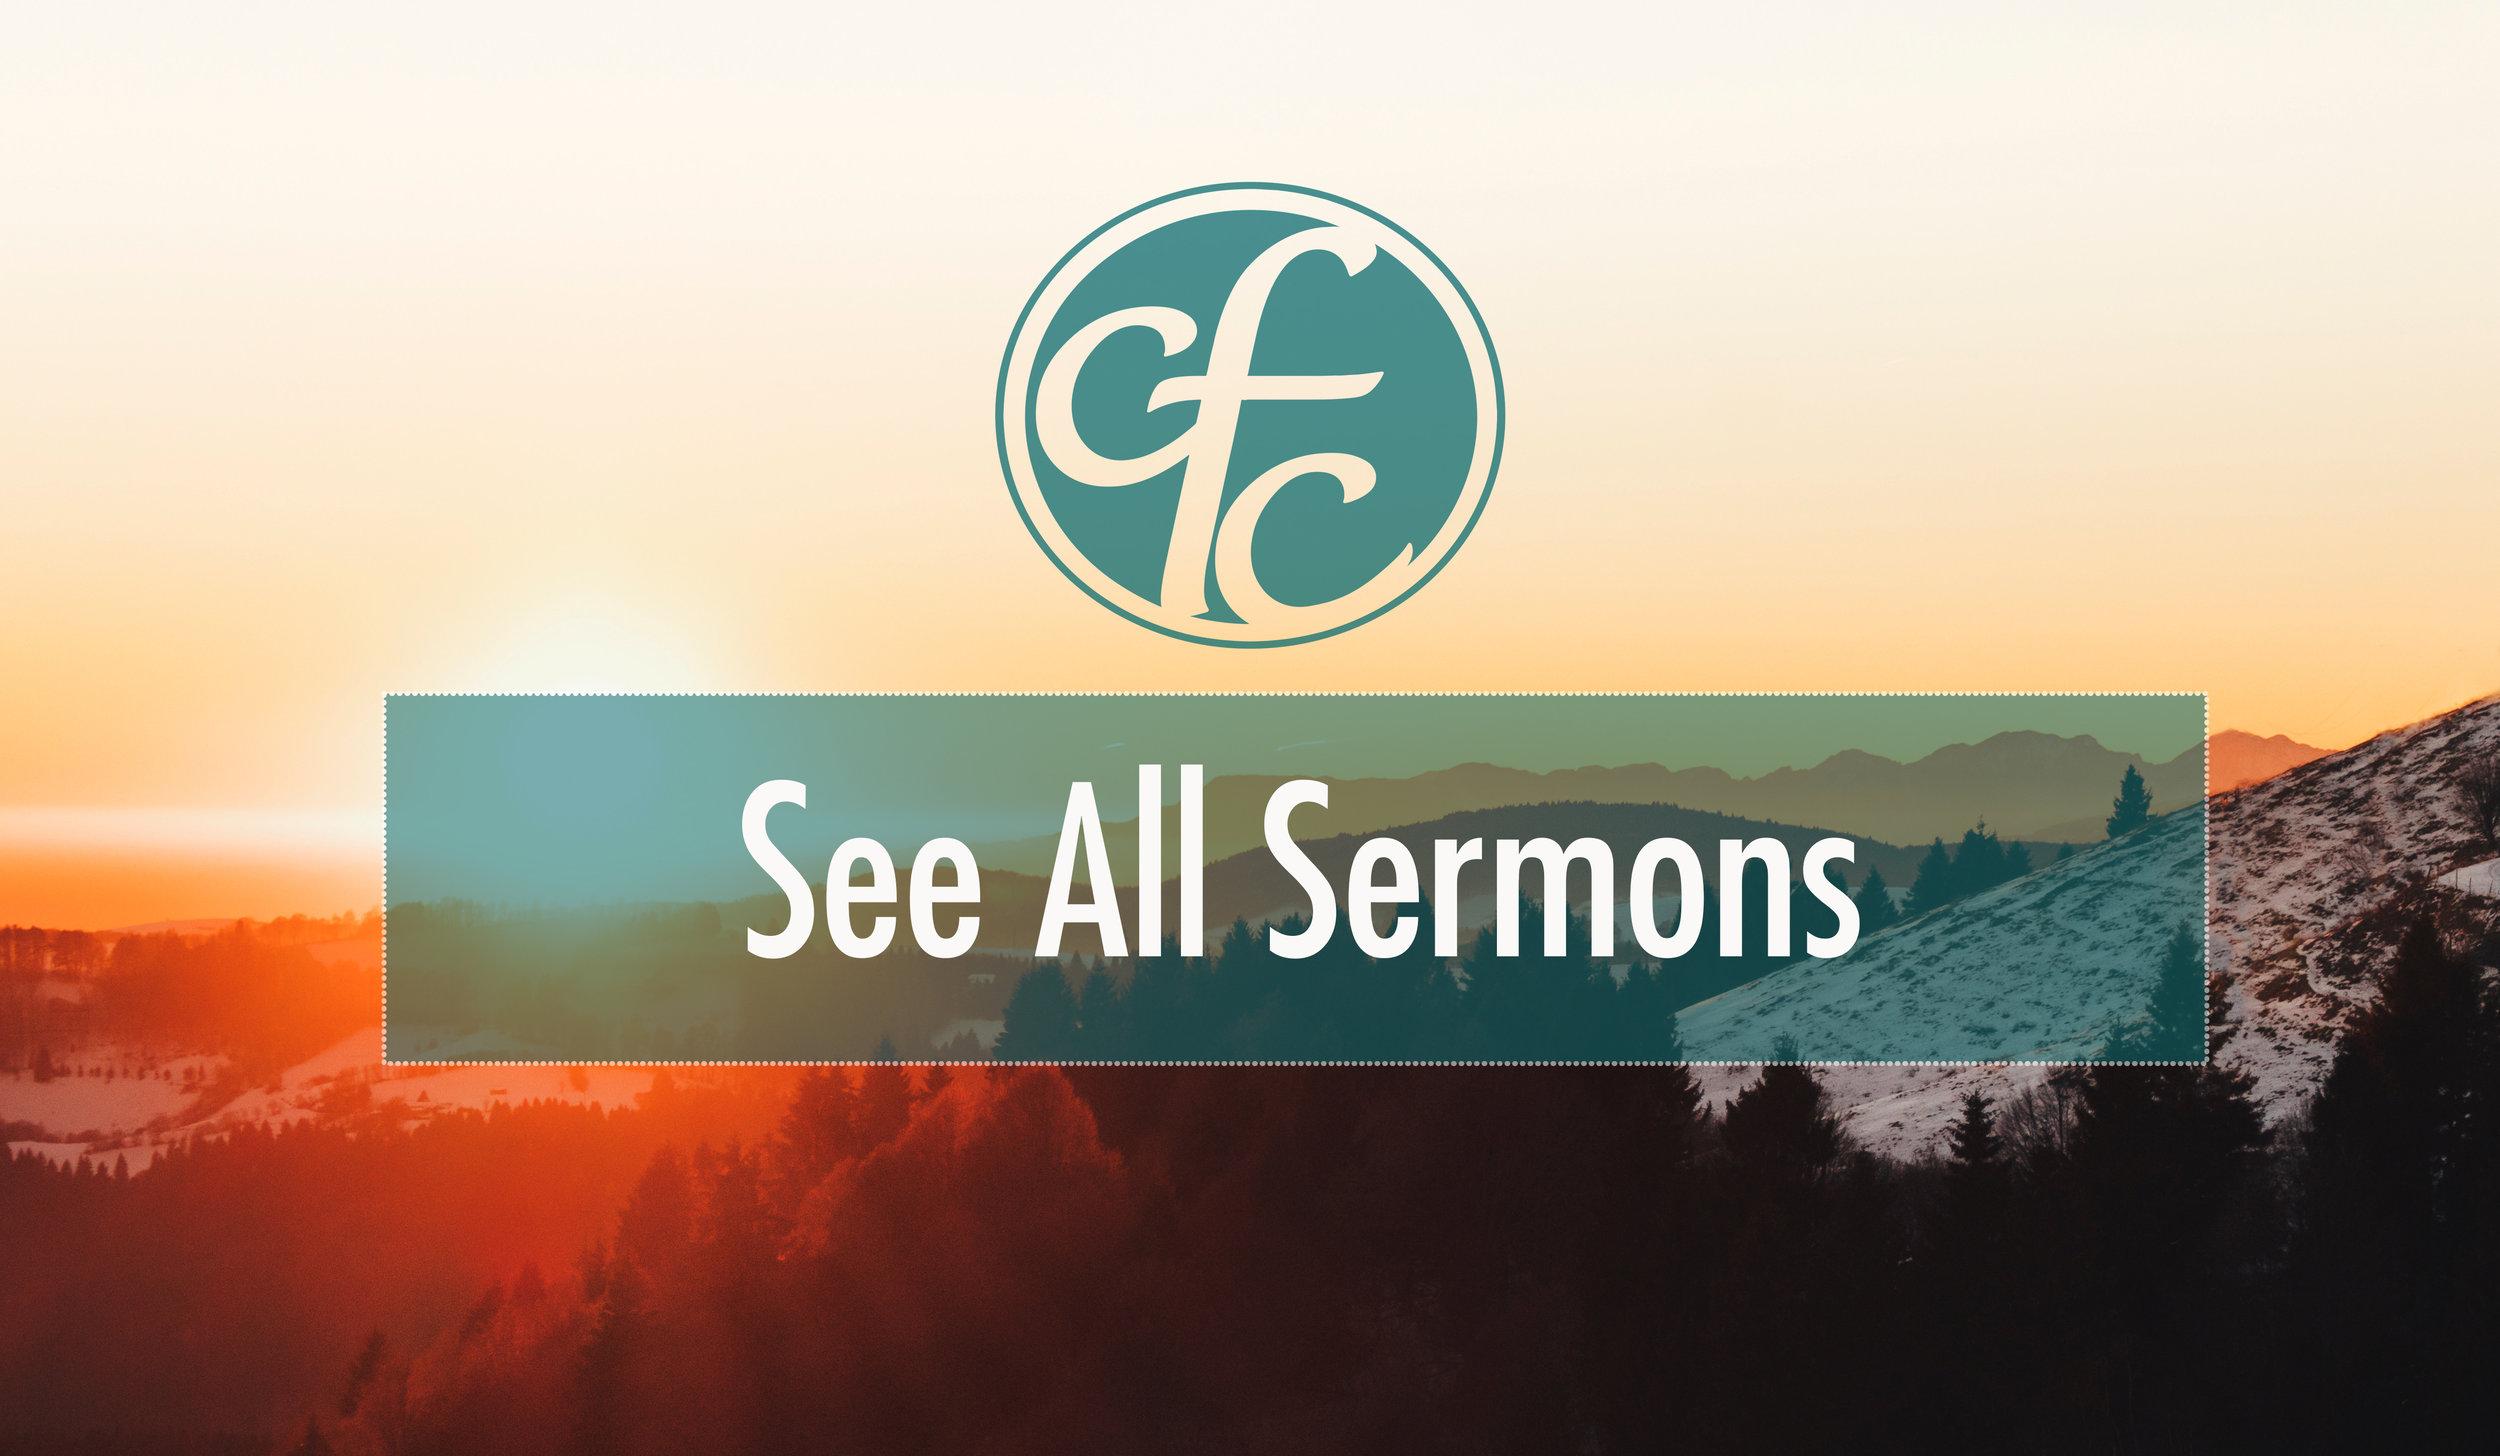 See All Sermons.jpg